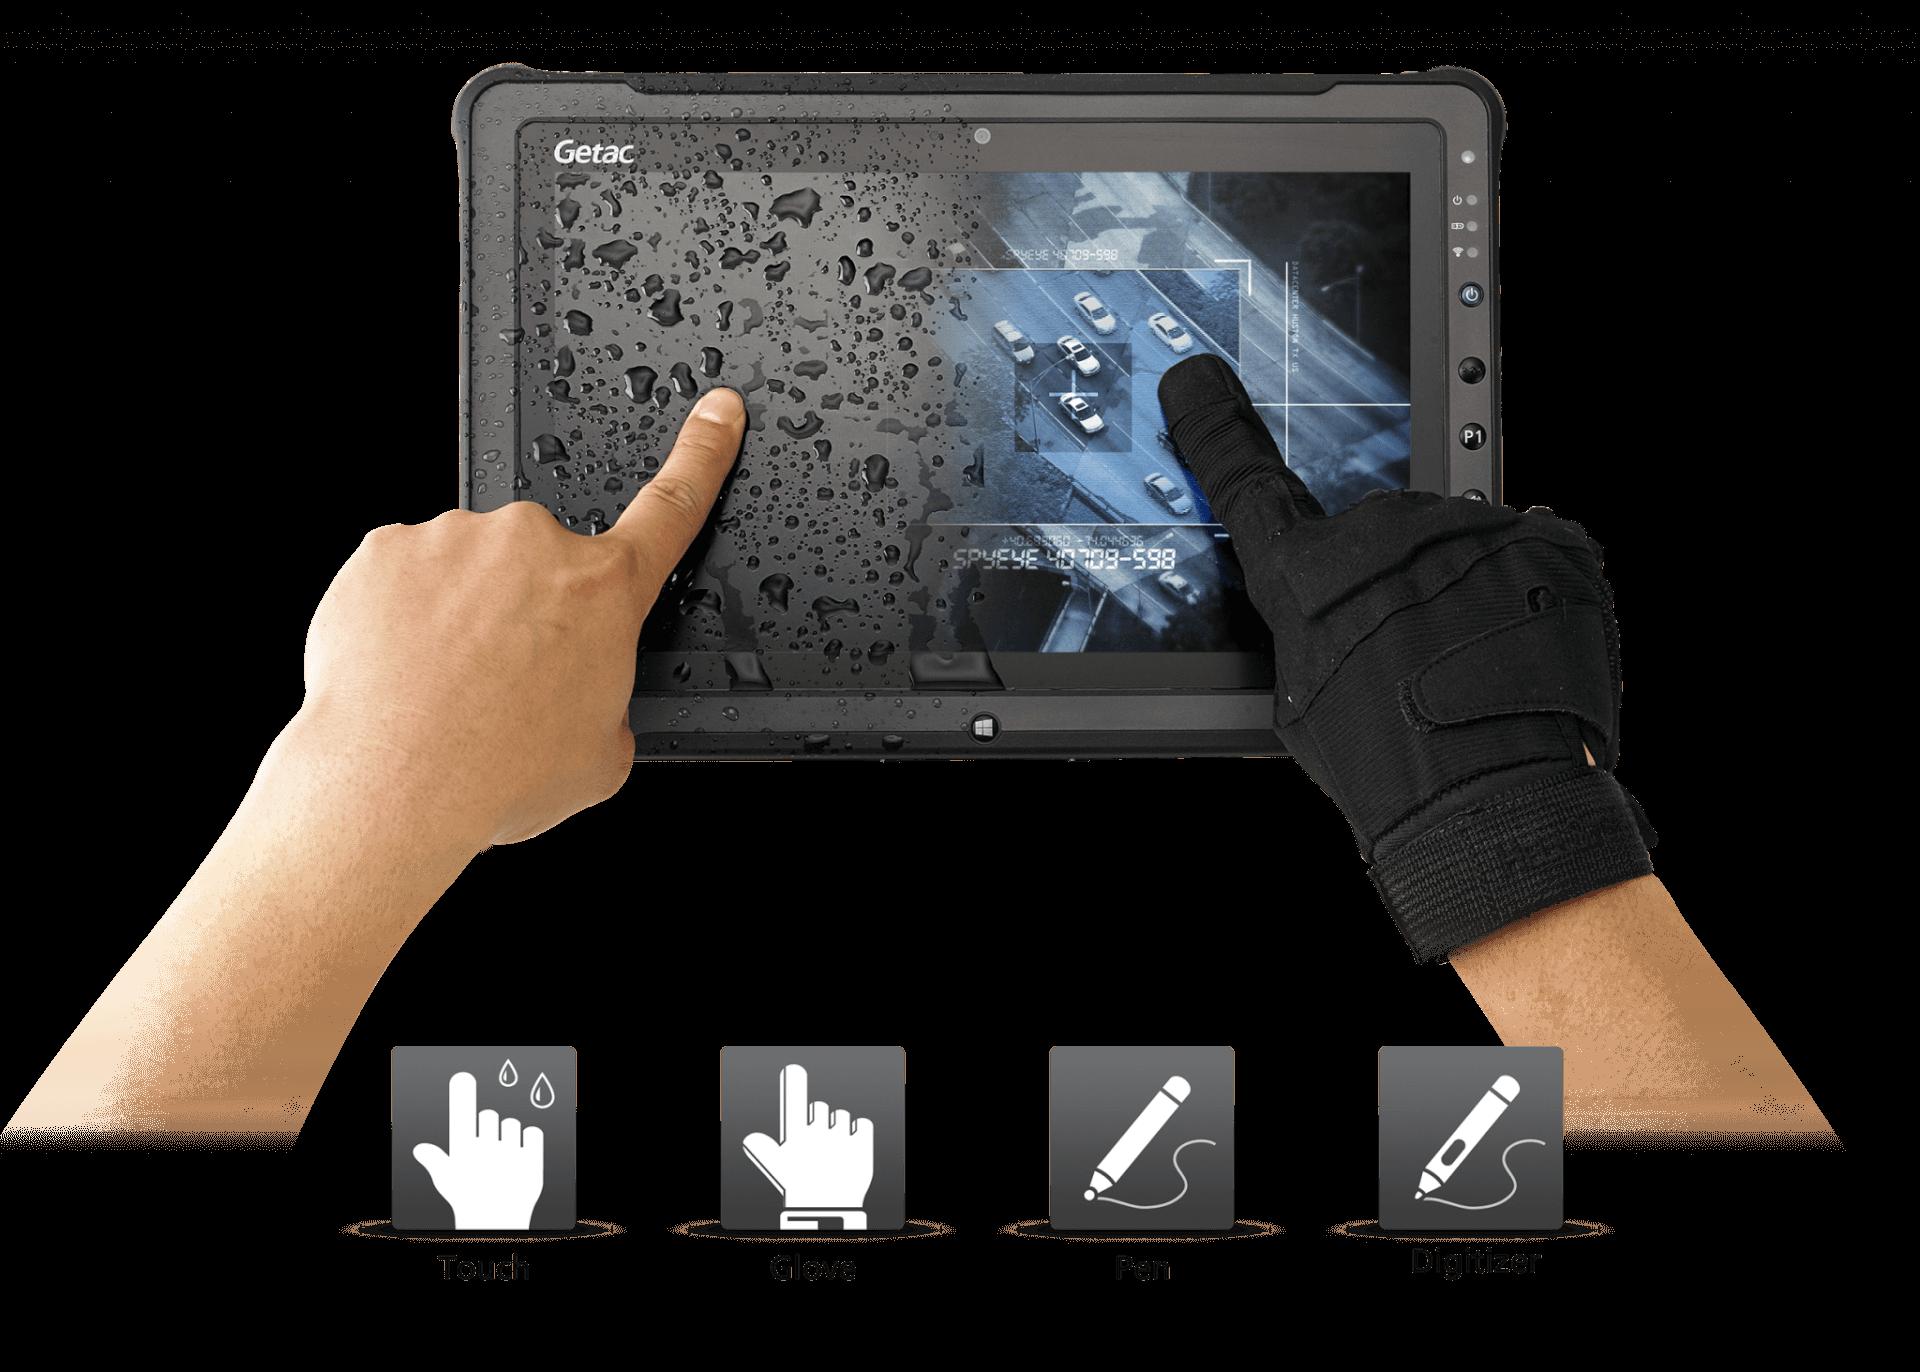 Getac F110 - ekran dotykowy LumiBond 2.0